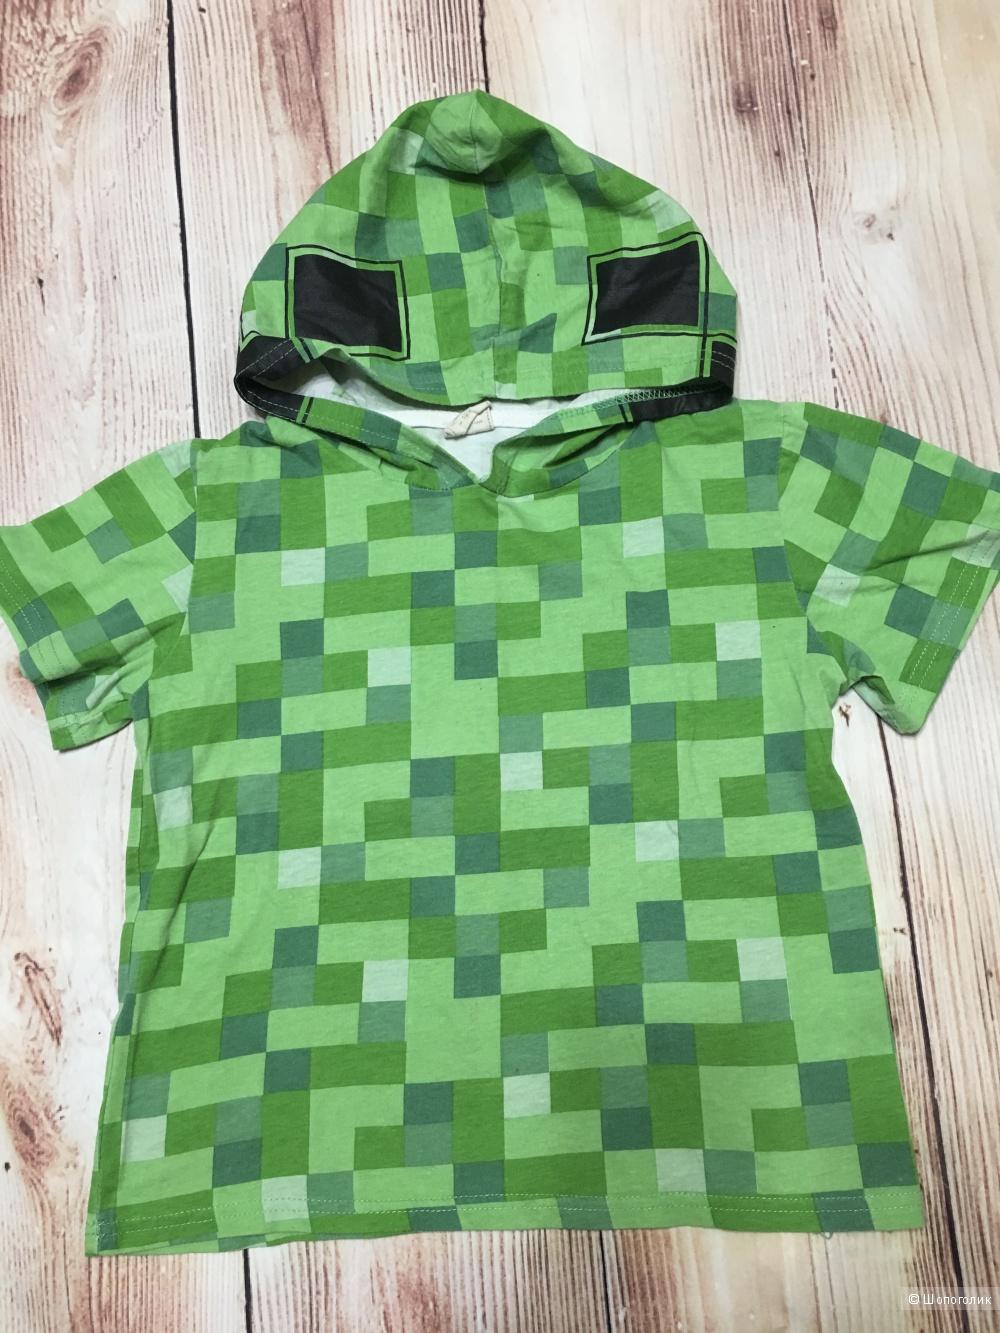 Детская футболка Майнкрафт, размер 120. На 5-6 лет